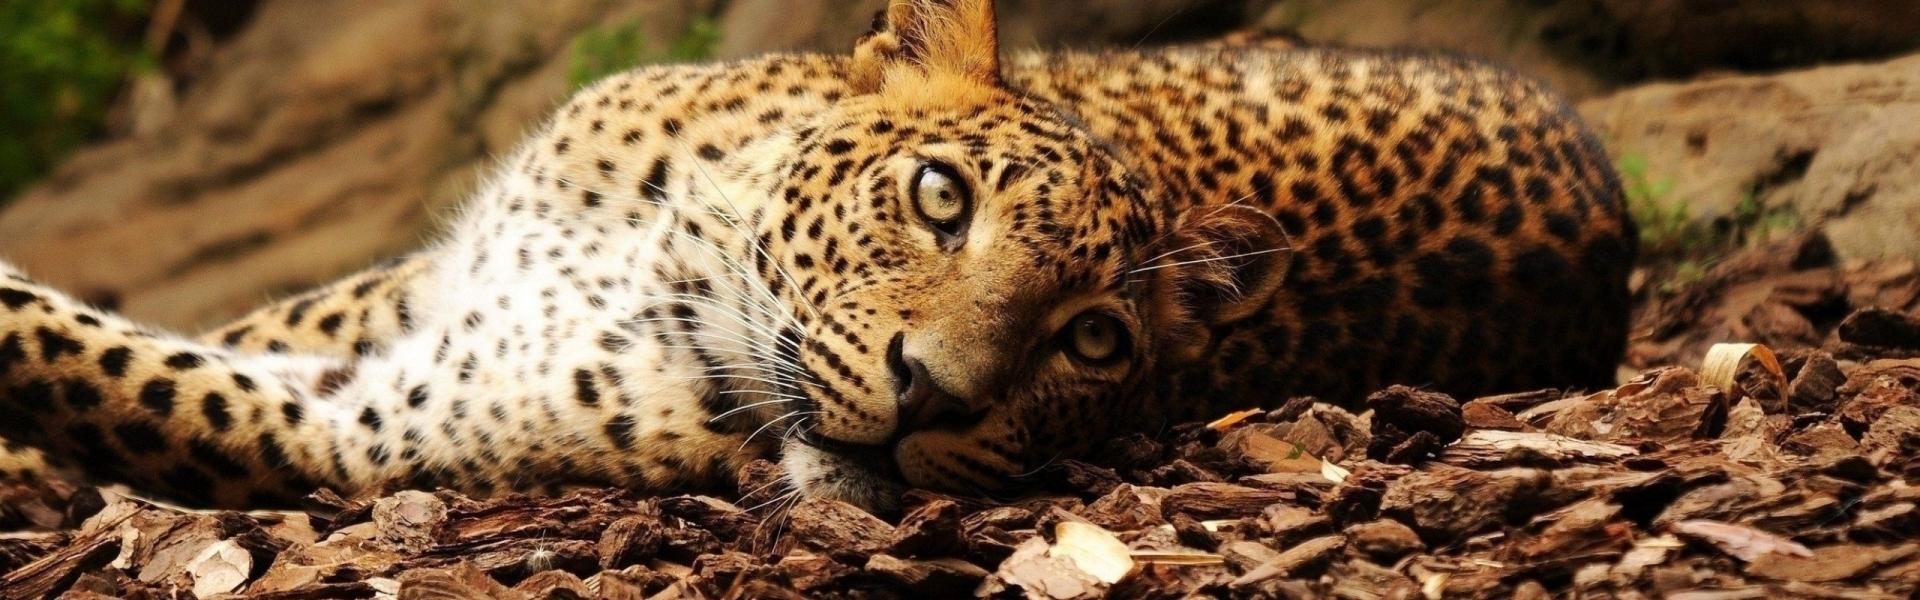 jaguar-62726_1920x600.jpg